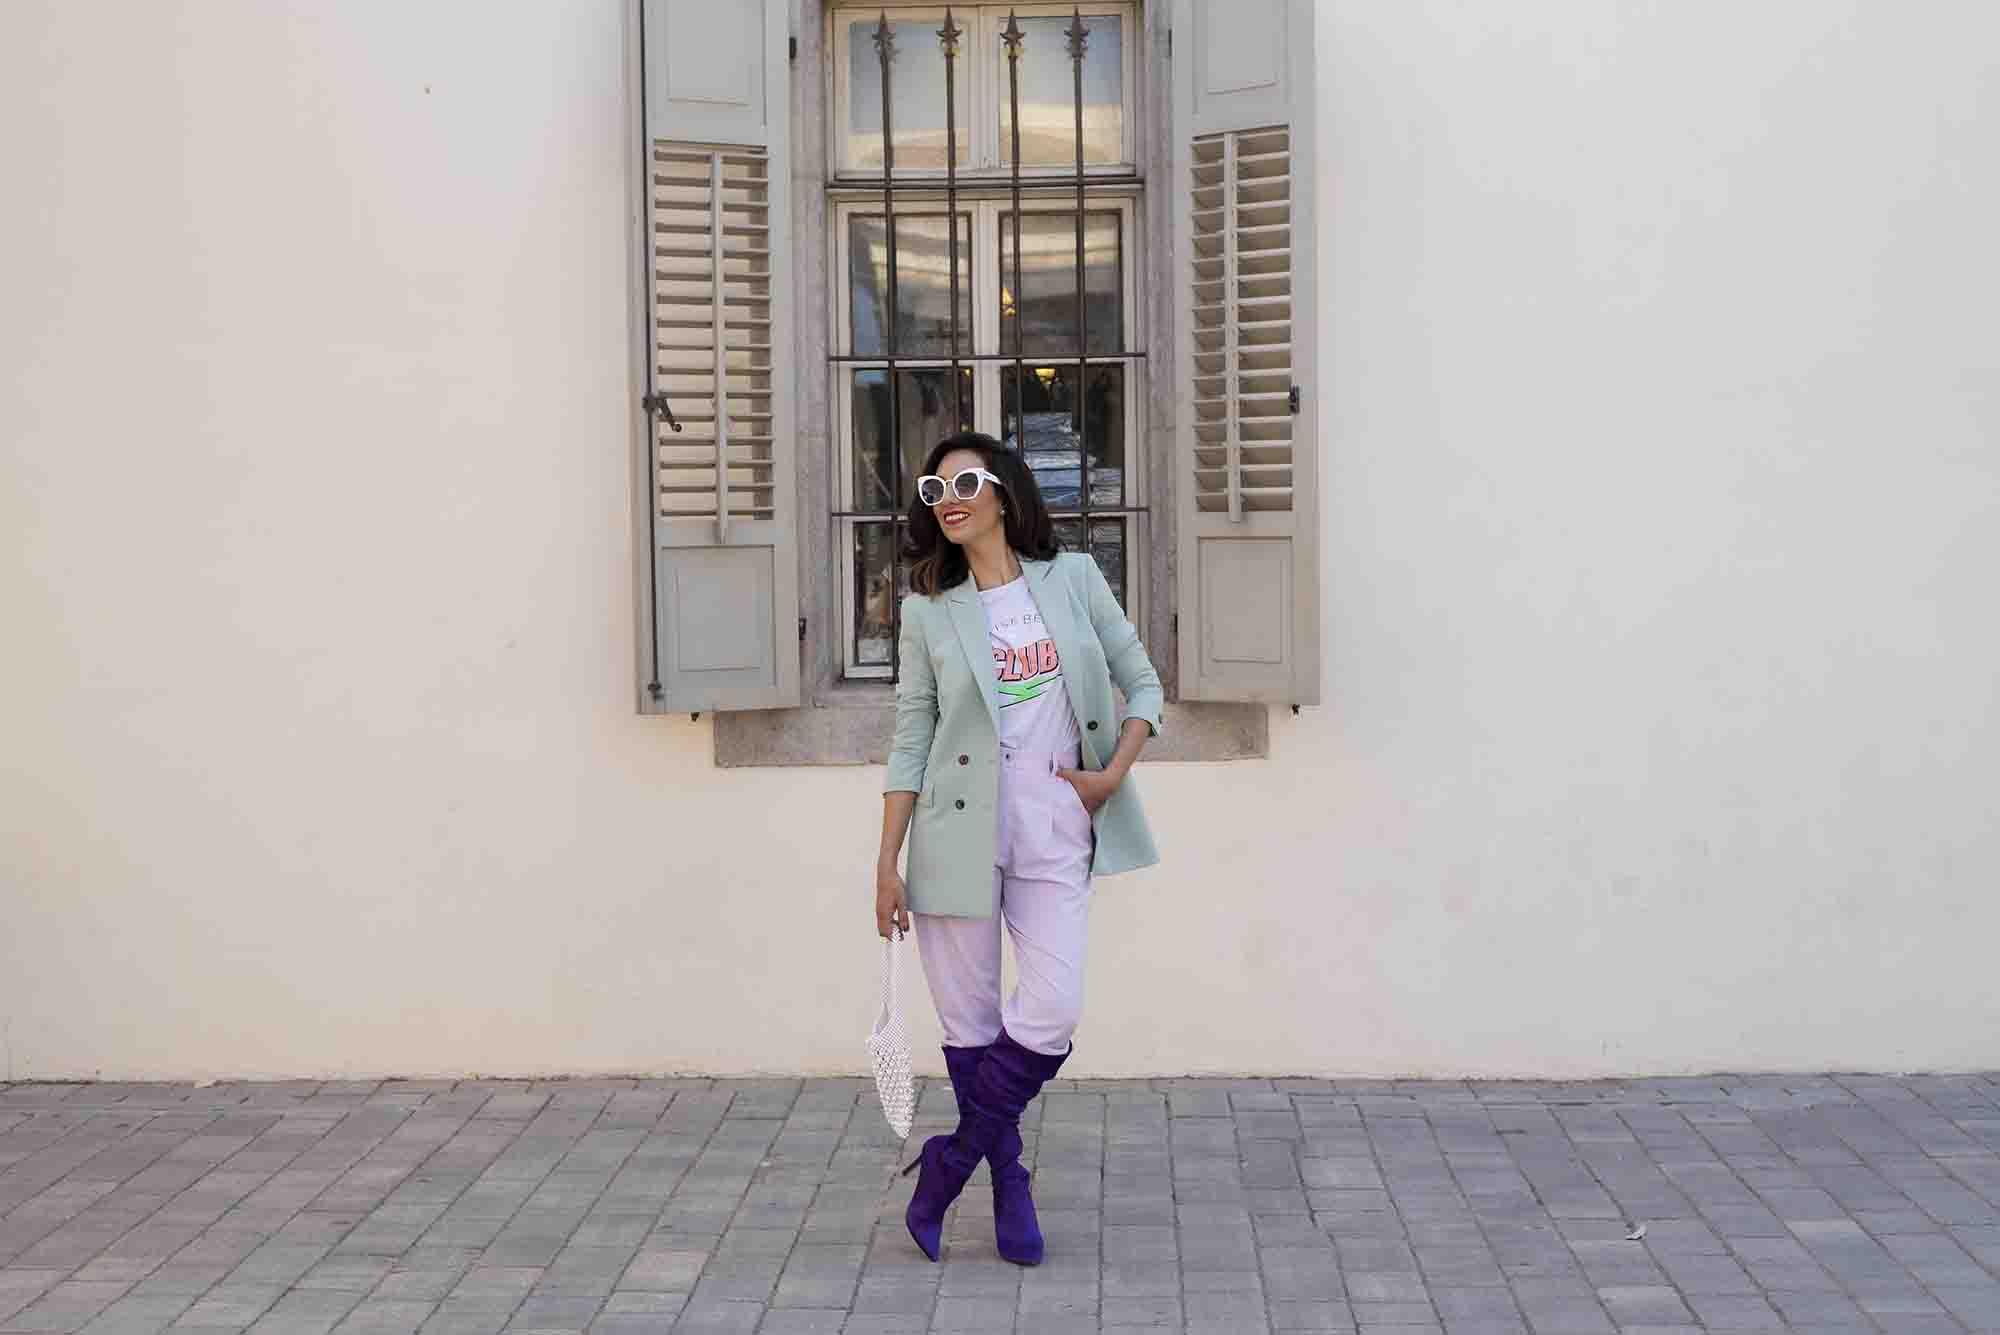 Fashion Israel-מגזין אופנה ישראלי, שגית שליו, צילום לימור יערי - 4